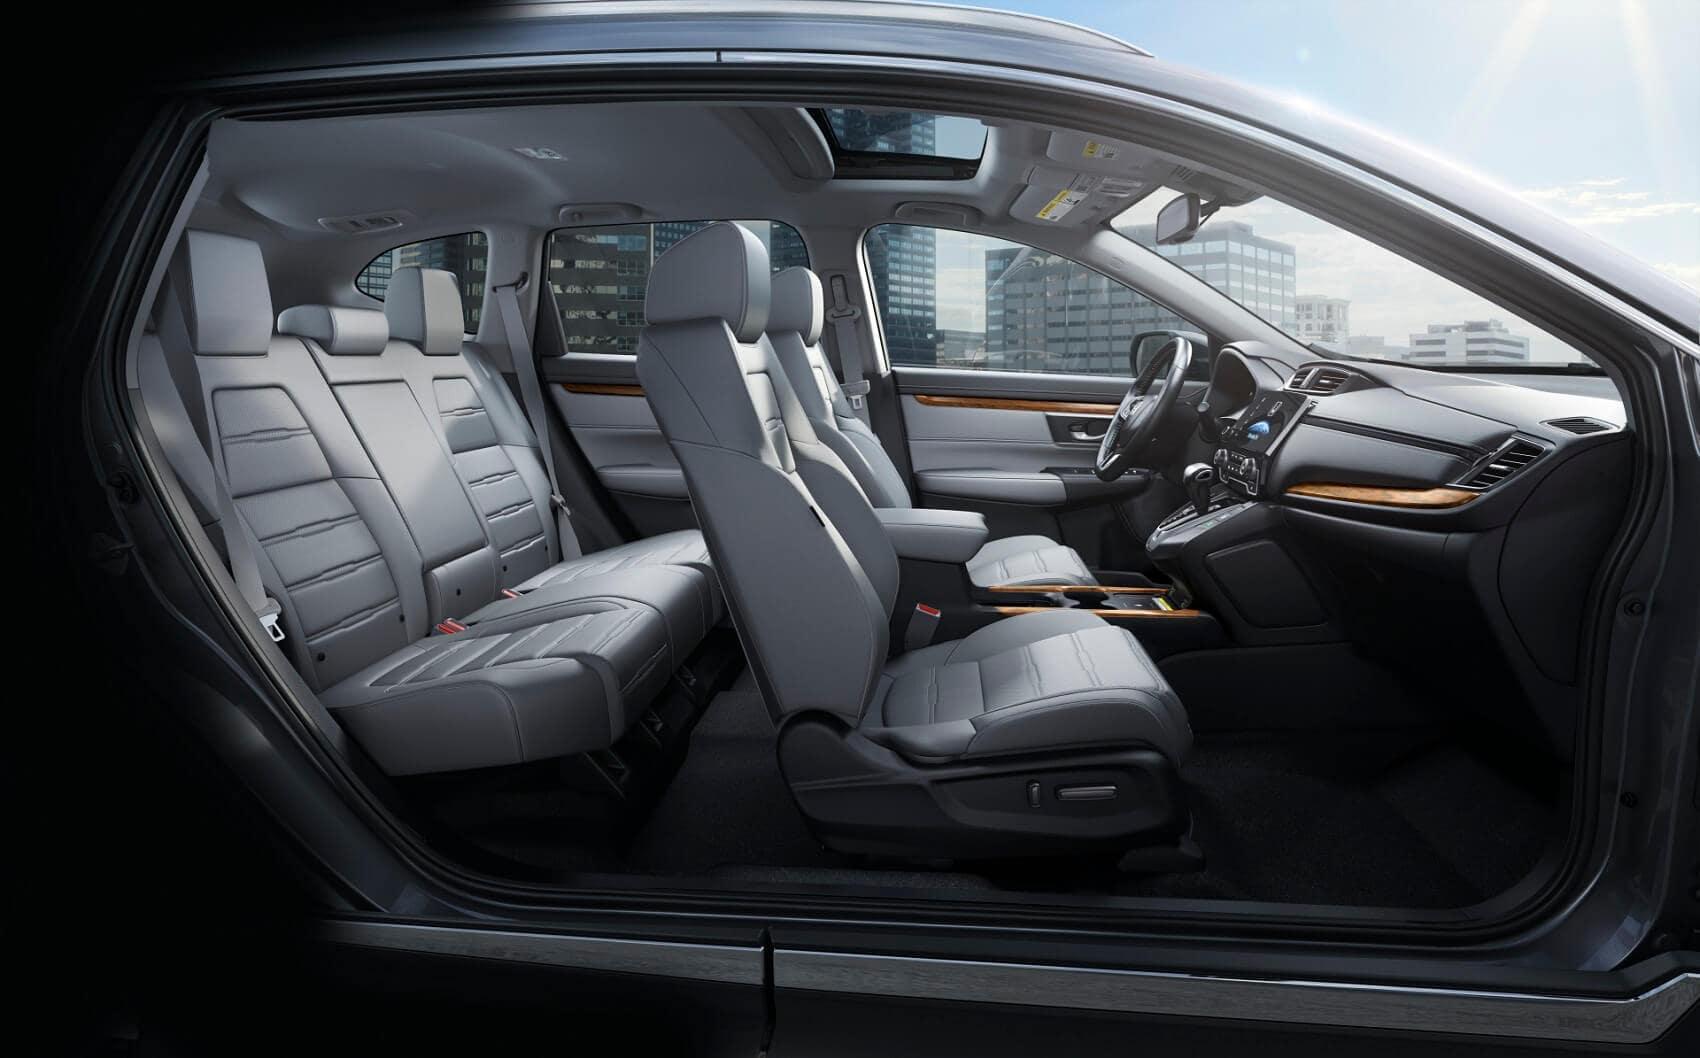 Honda CR-V Interior Space